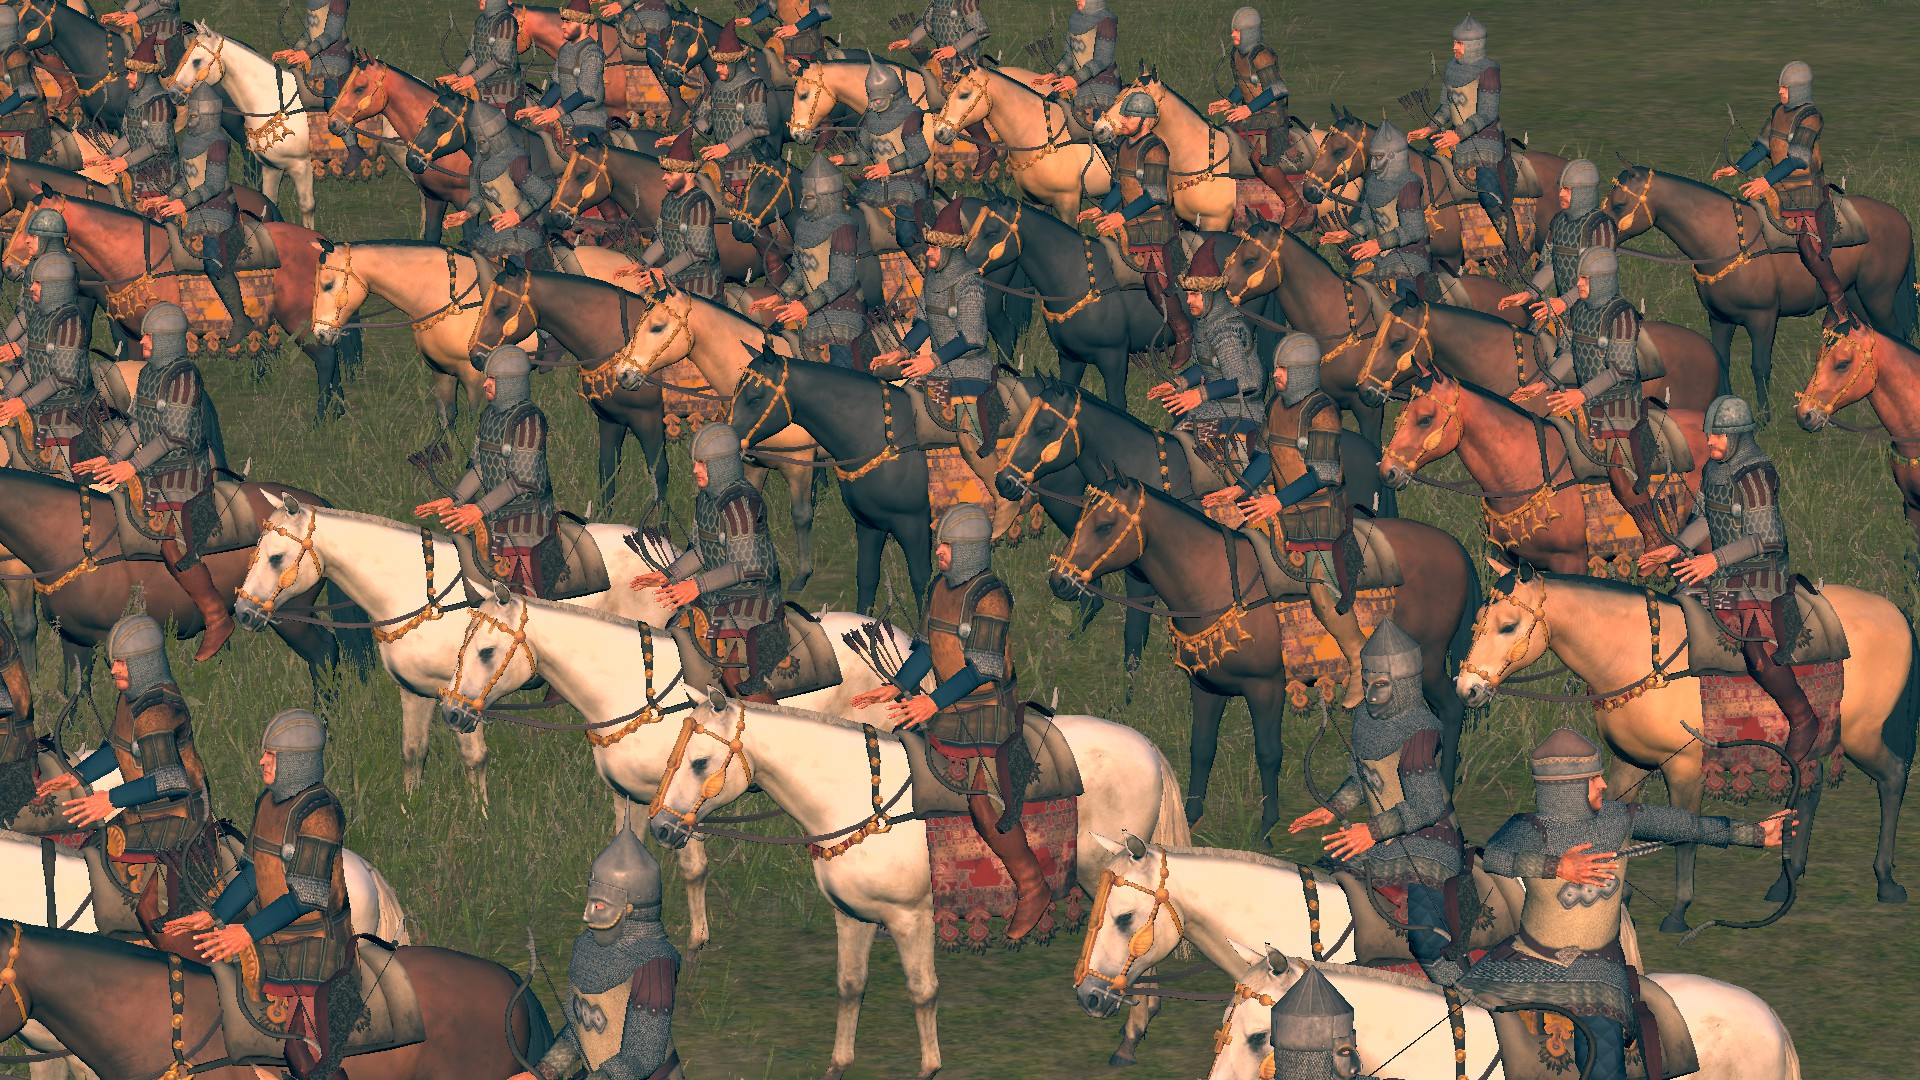 Medieval 3dxxxvid pics adult vids